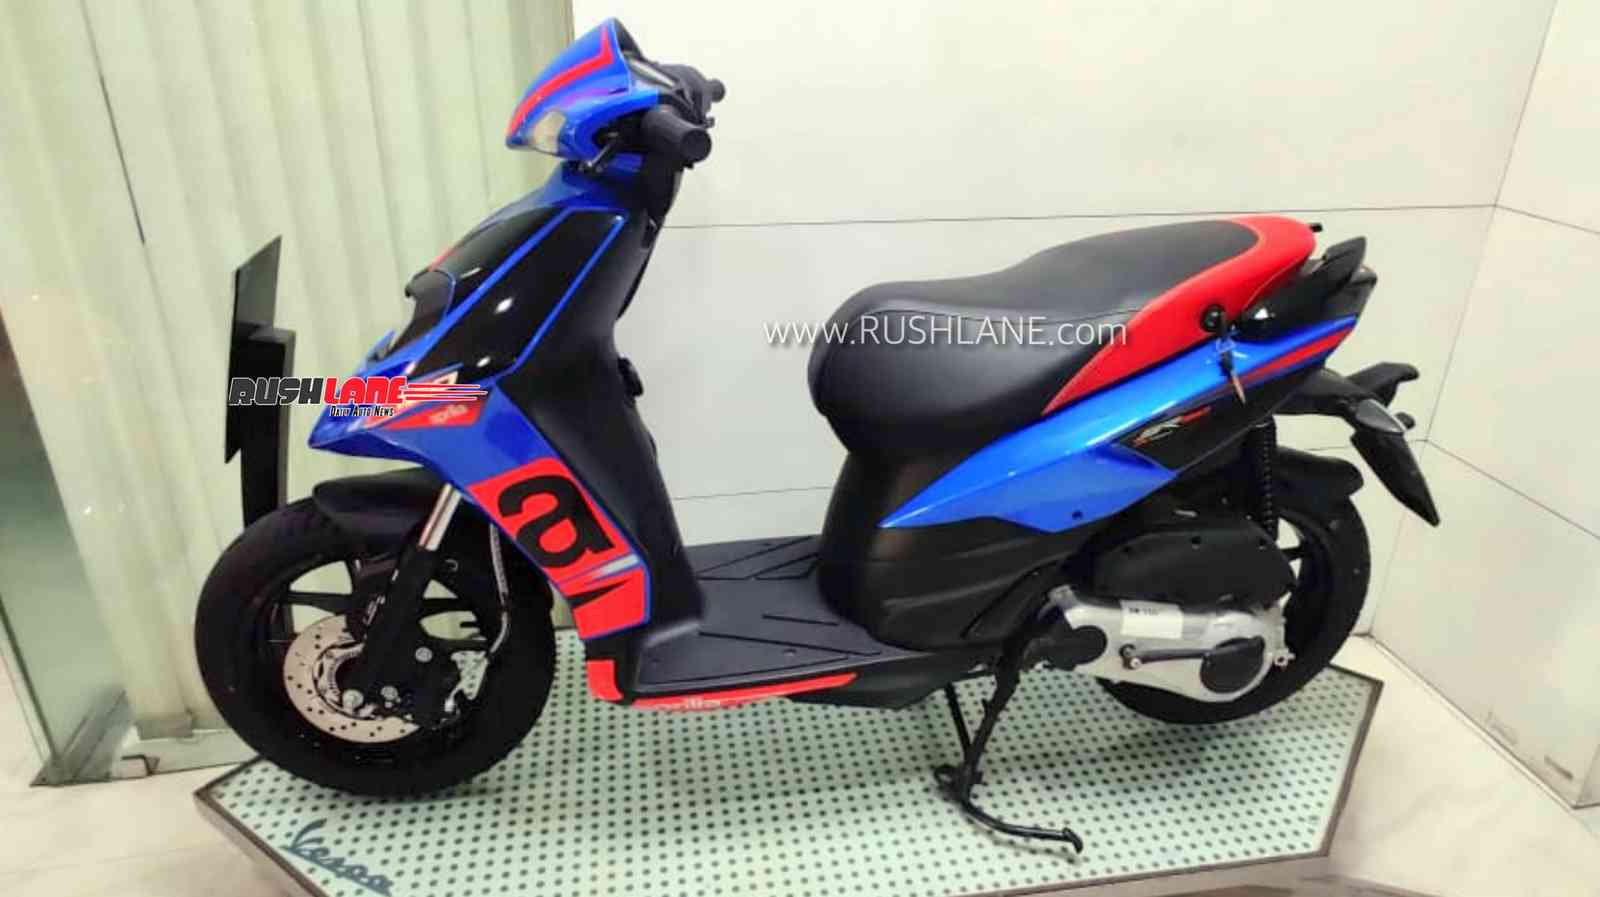 2020 Aprilia BS6 scooter